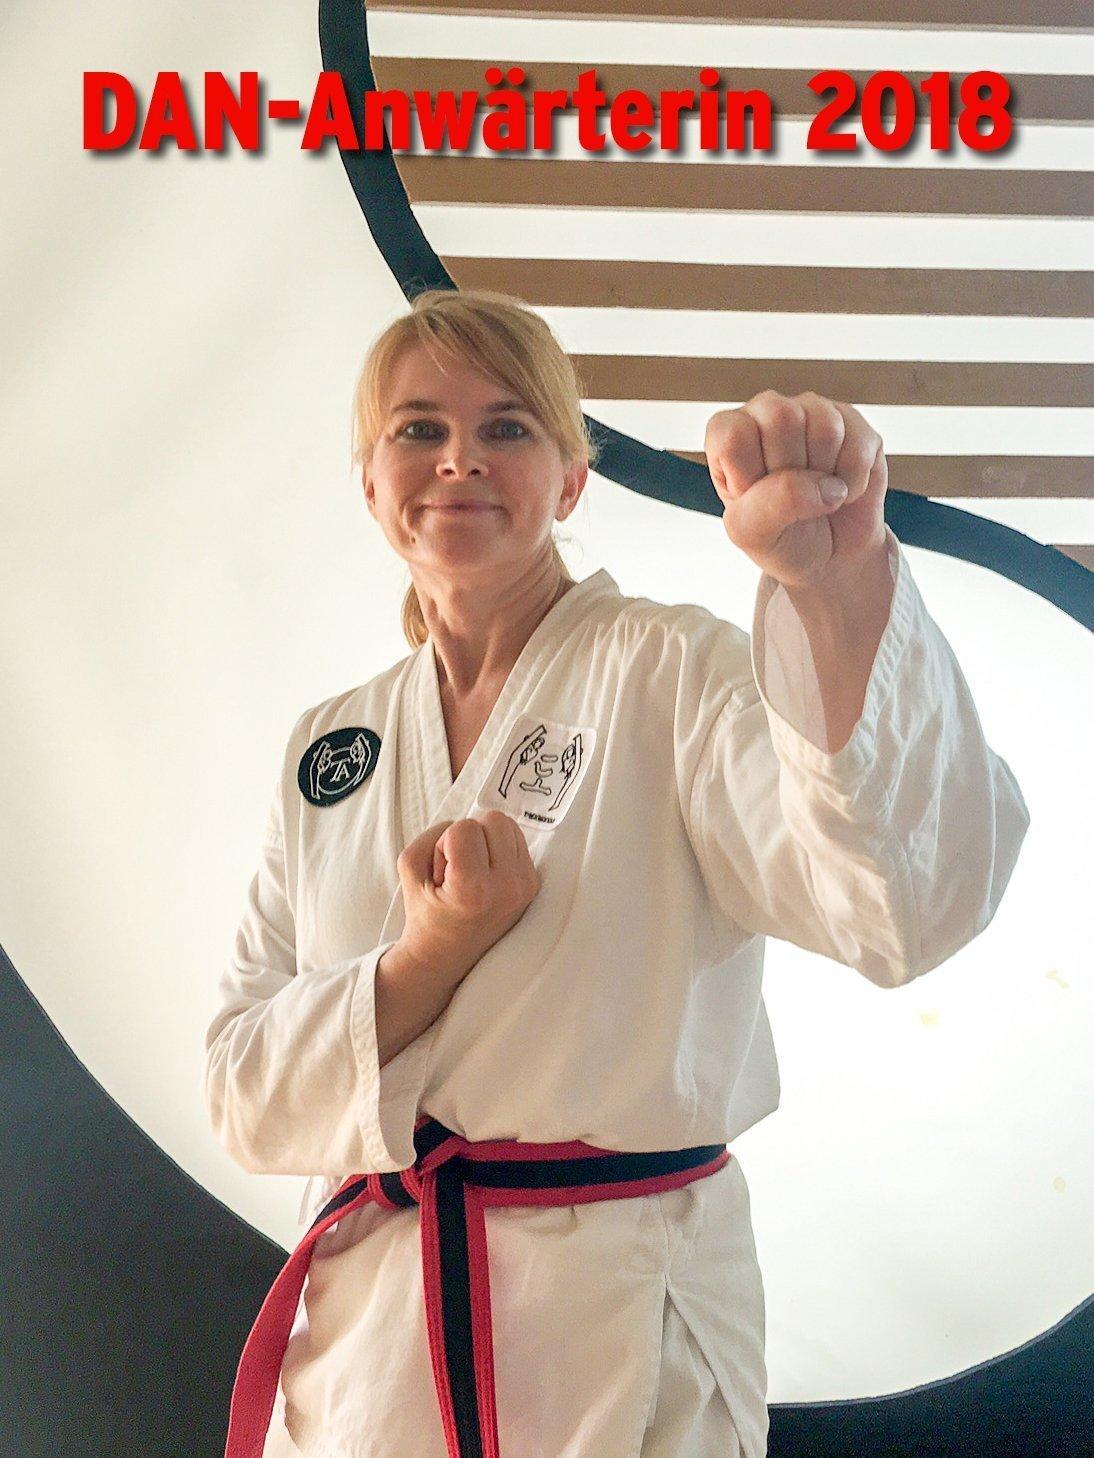 YOUNG-UNG Taekwondo Bulgarien-Camp DAN-Anwärter Kampfsport